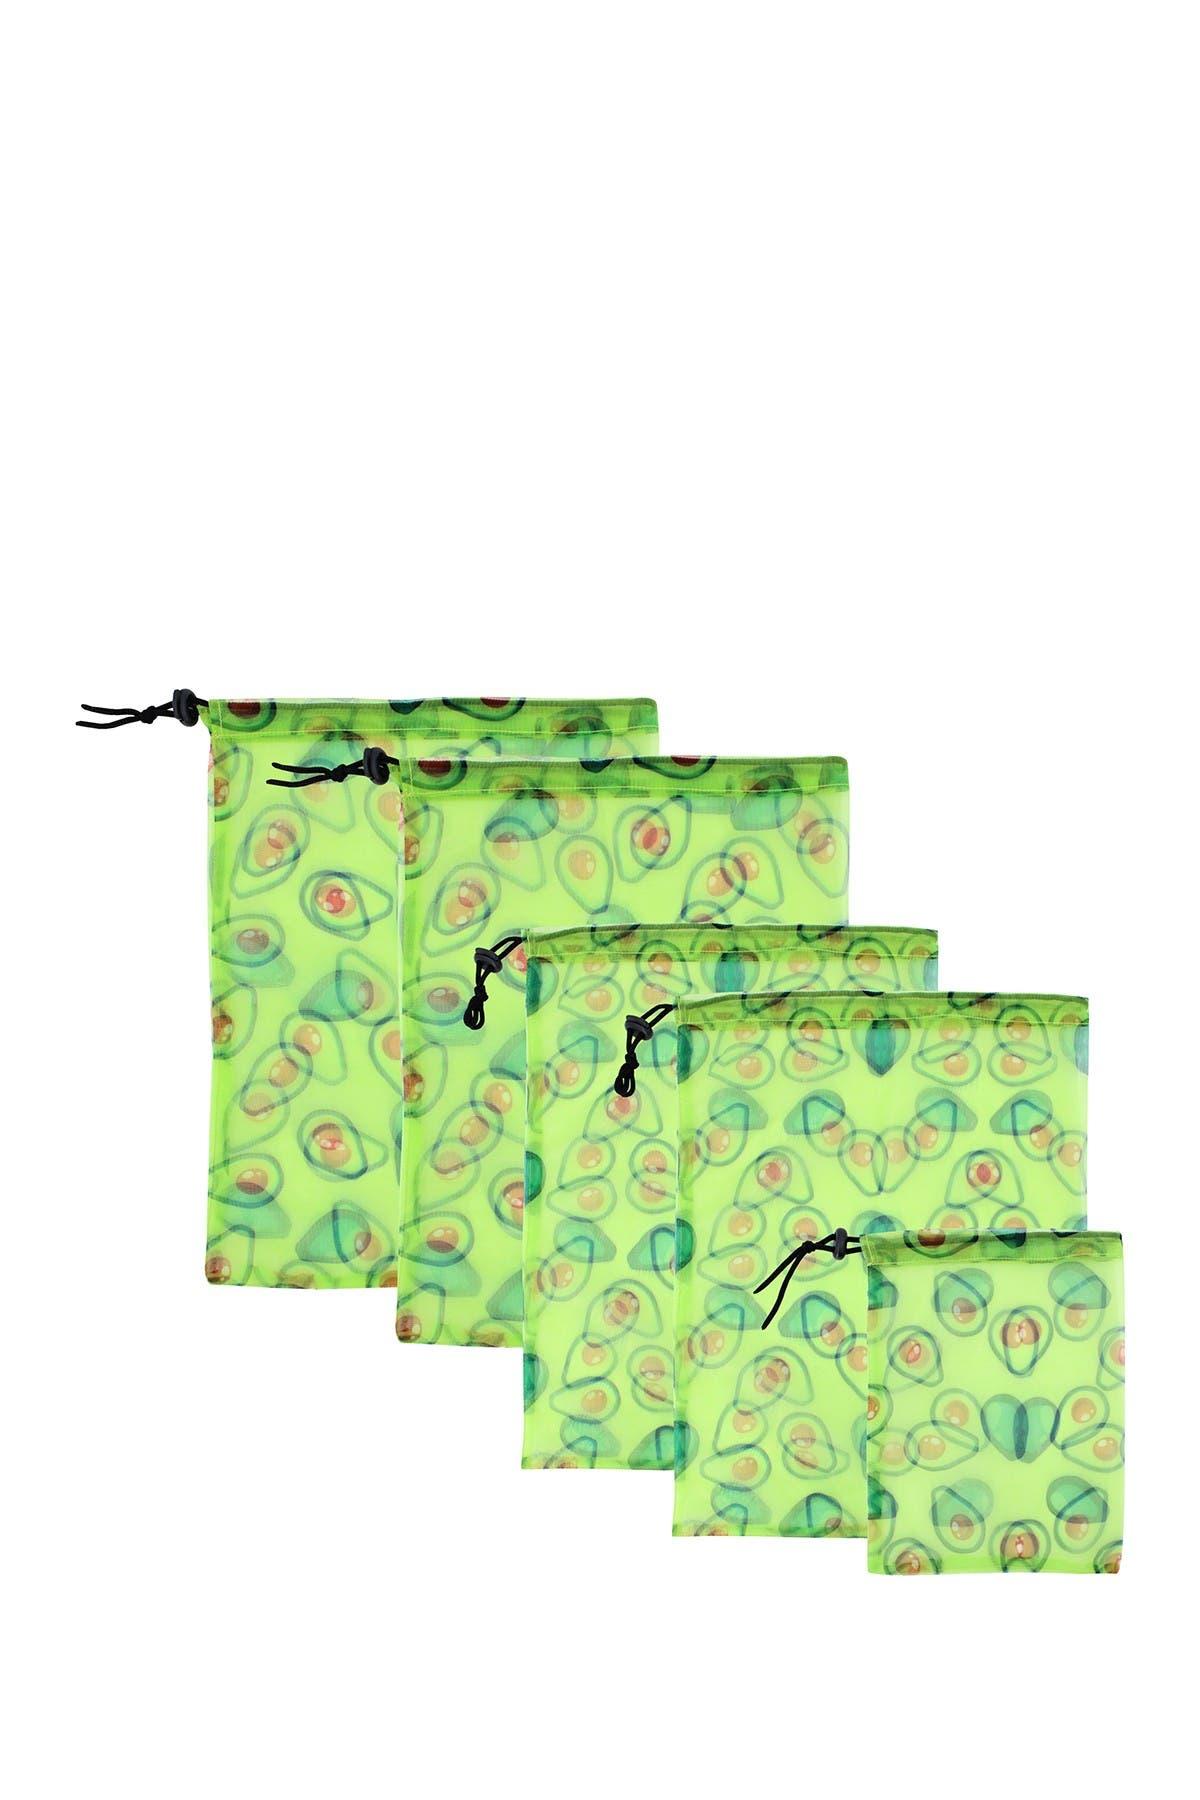 Image of MYTAGALONGS Avocado Produce Bags - Set of 5